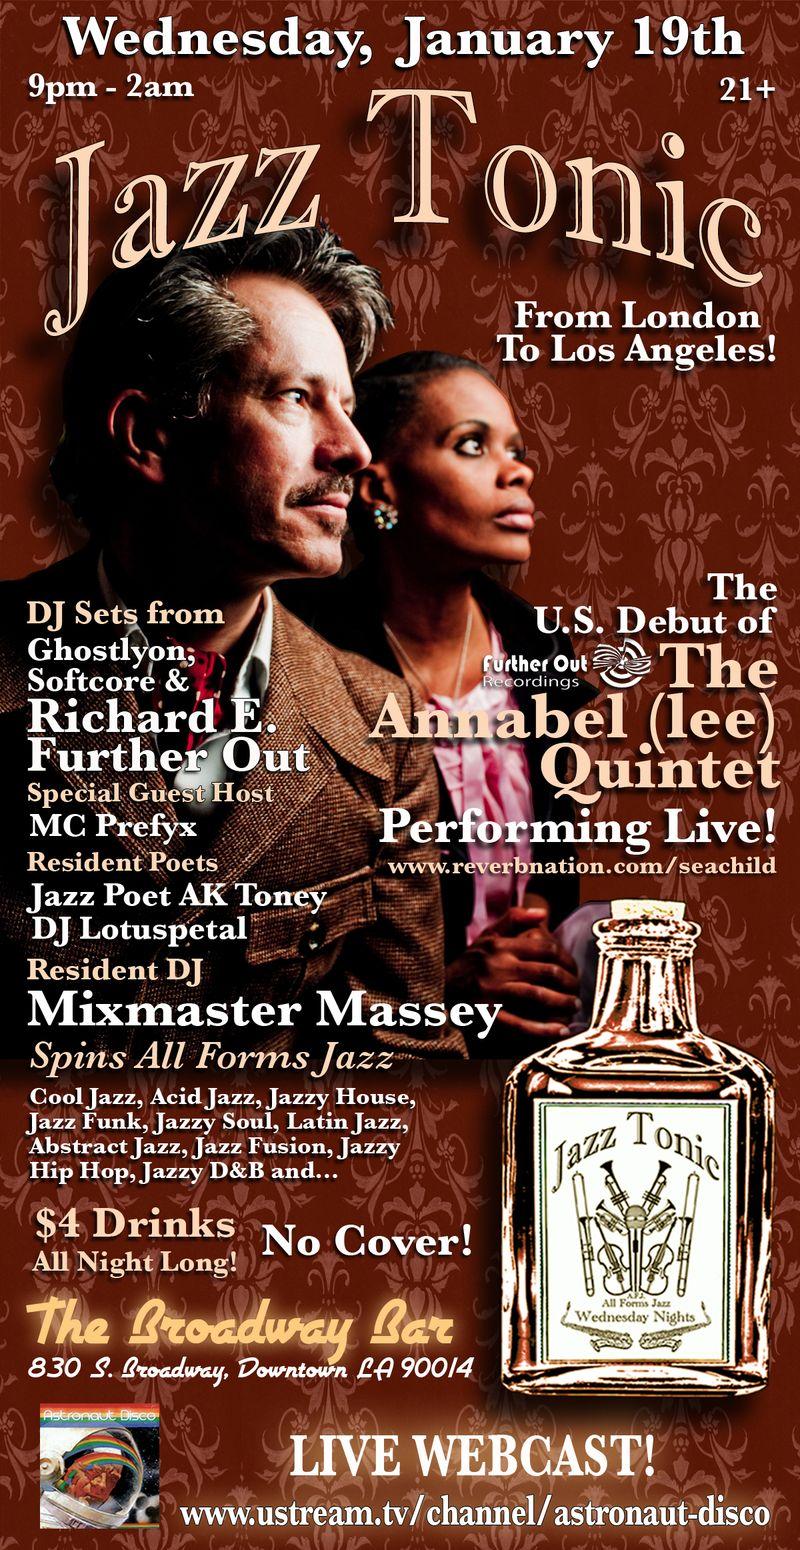 Jazz Tonic Flyer 1.19.11